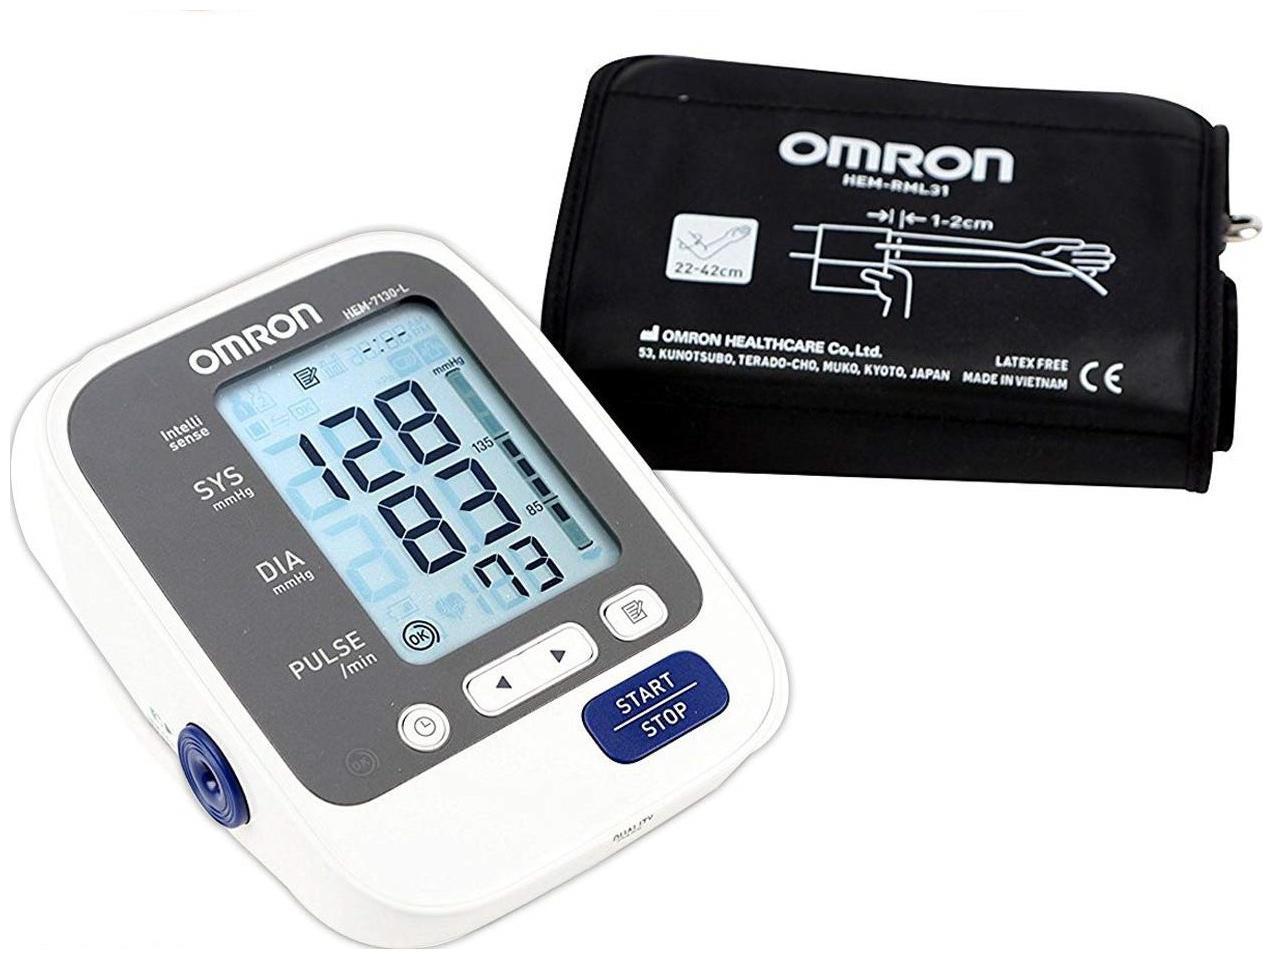 Omron HEM 7130L Fully Automatic Digital Blood Pressure Monitor/ Blood Pressure Machine...